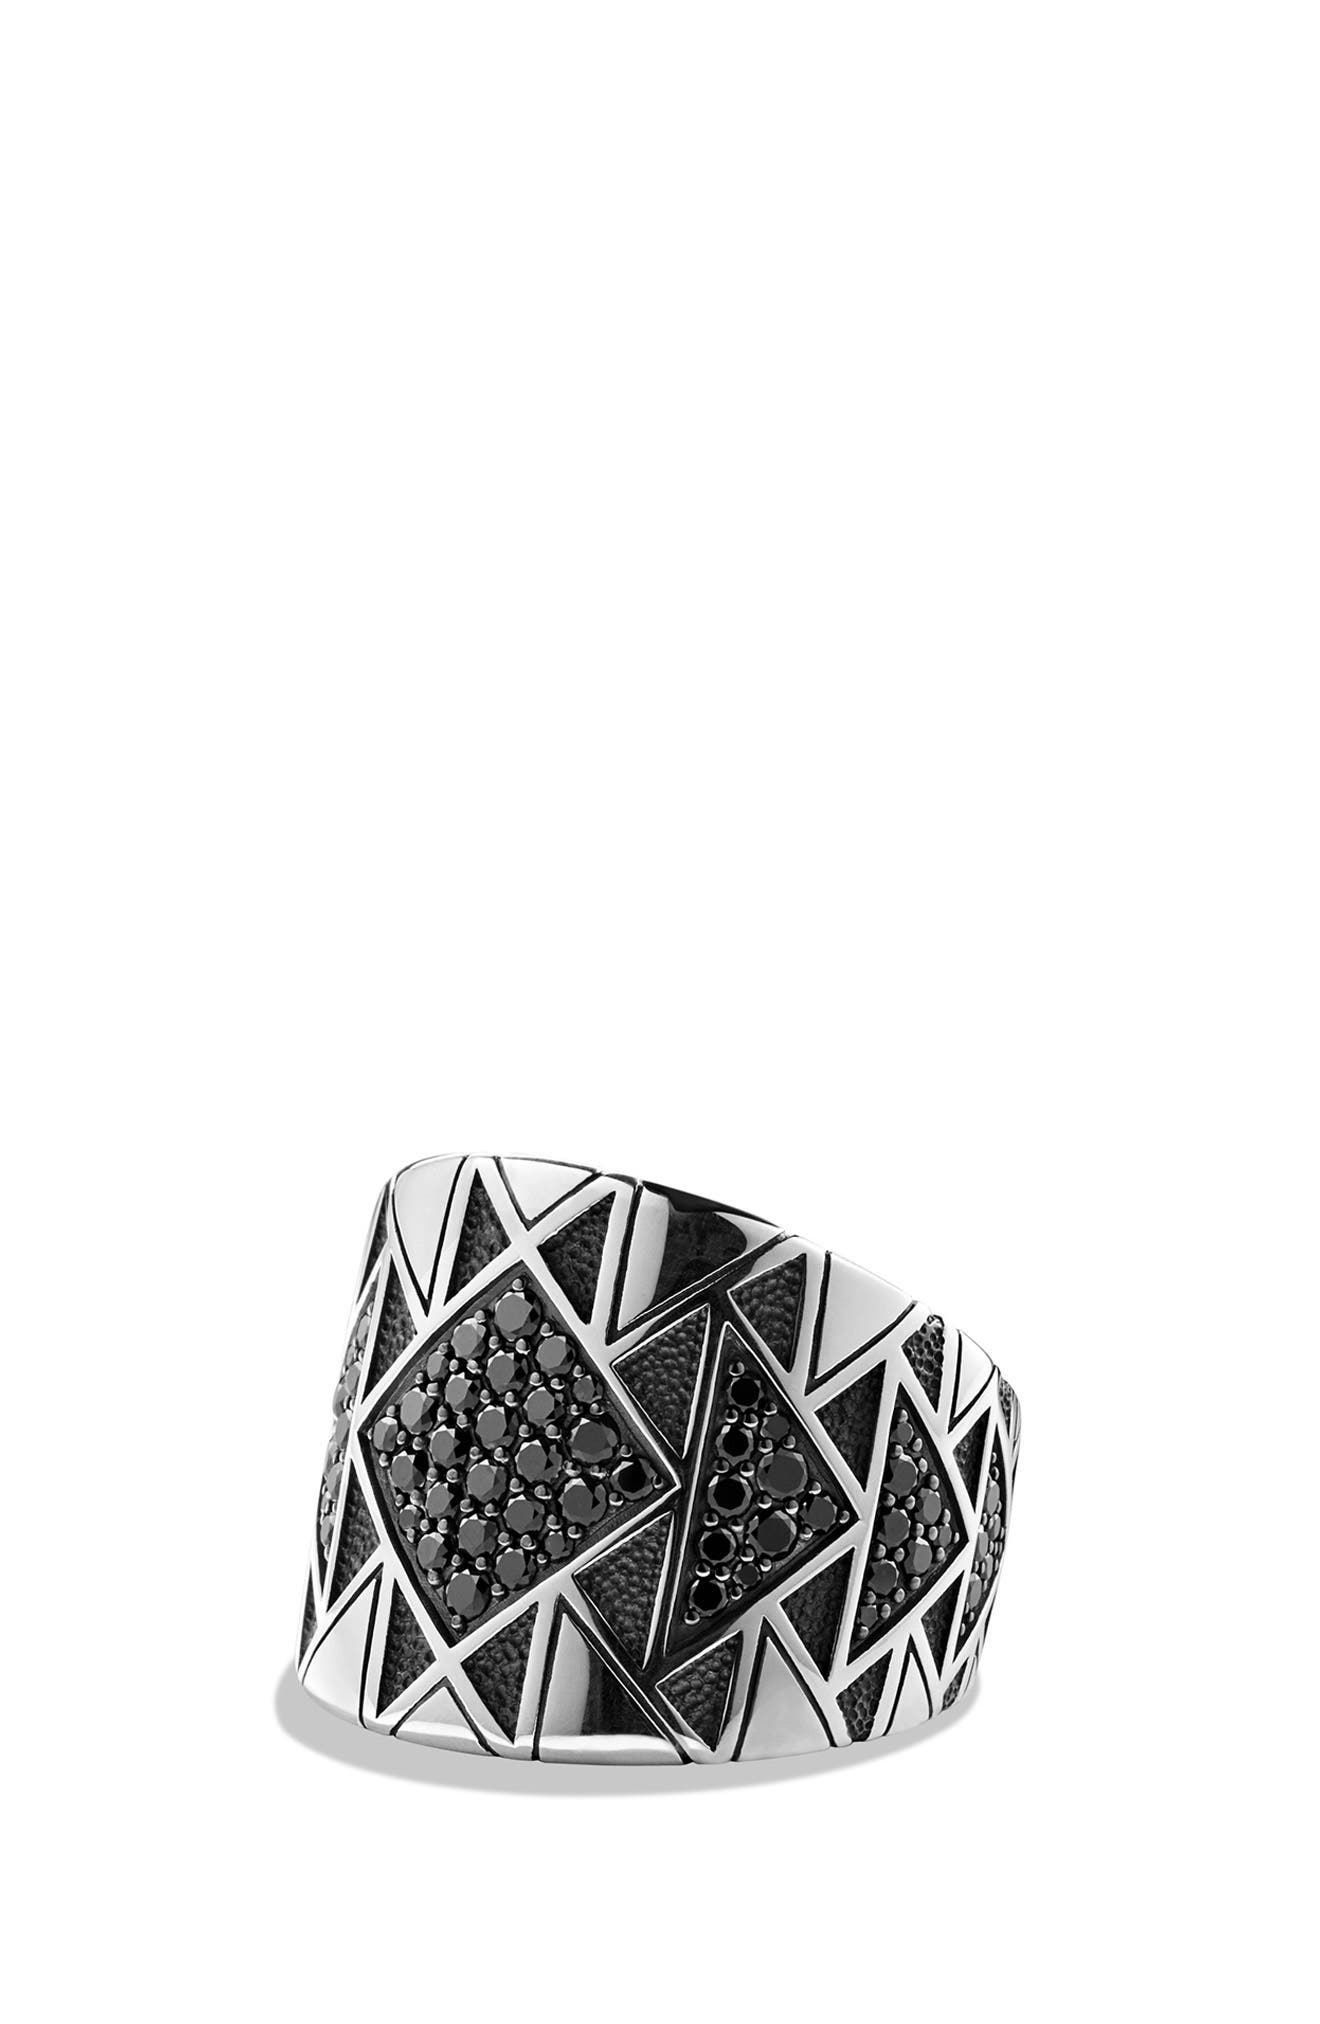 Southwest Signet Ring with Black Diamonds,                             Alternate thumbnail 6, color,